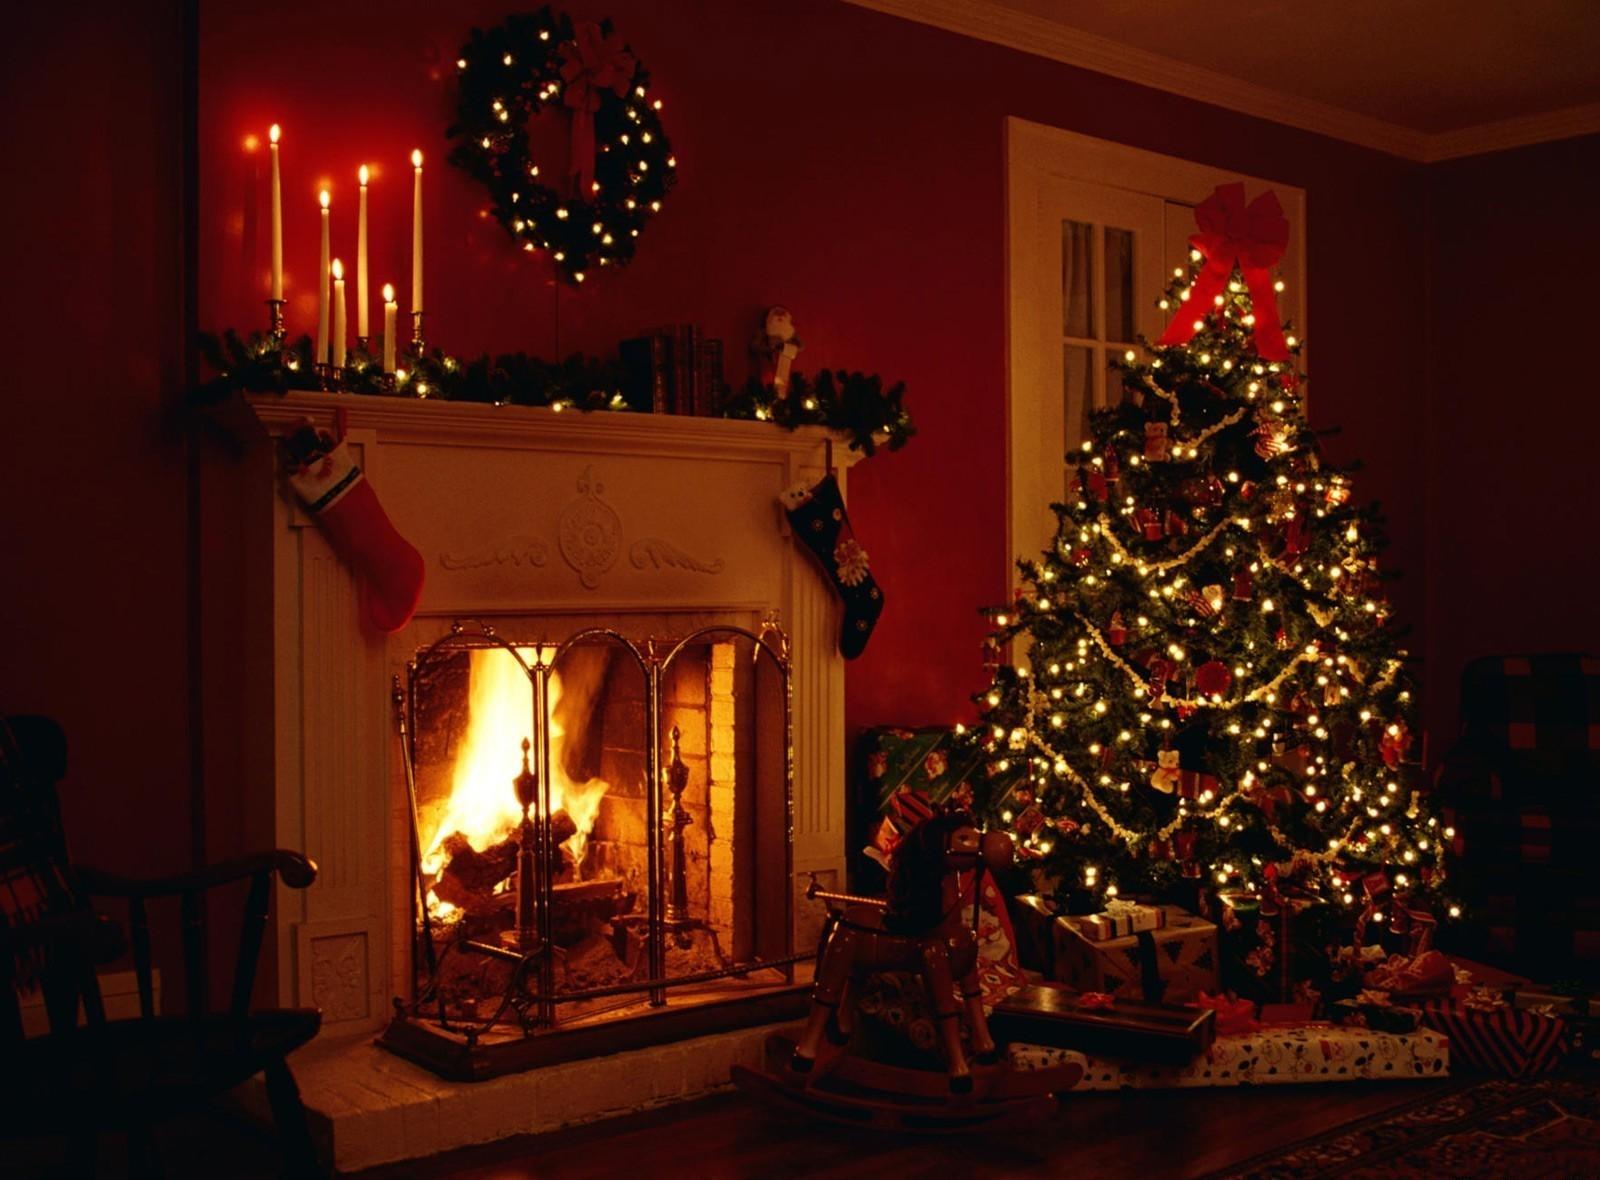 61] Christmas Fireplace Wallpaper on WallpaperSafari 1600x1180